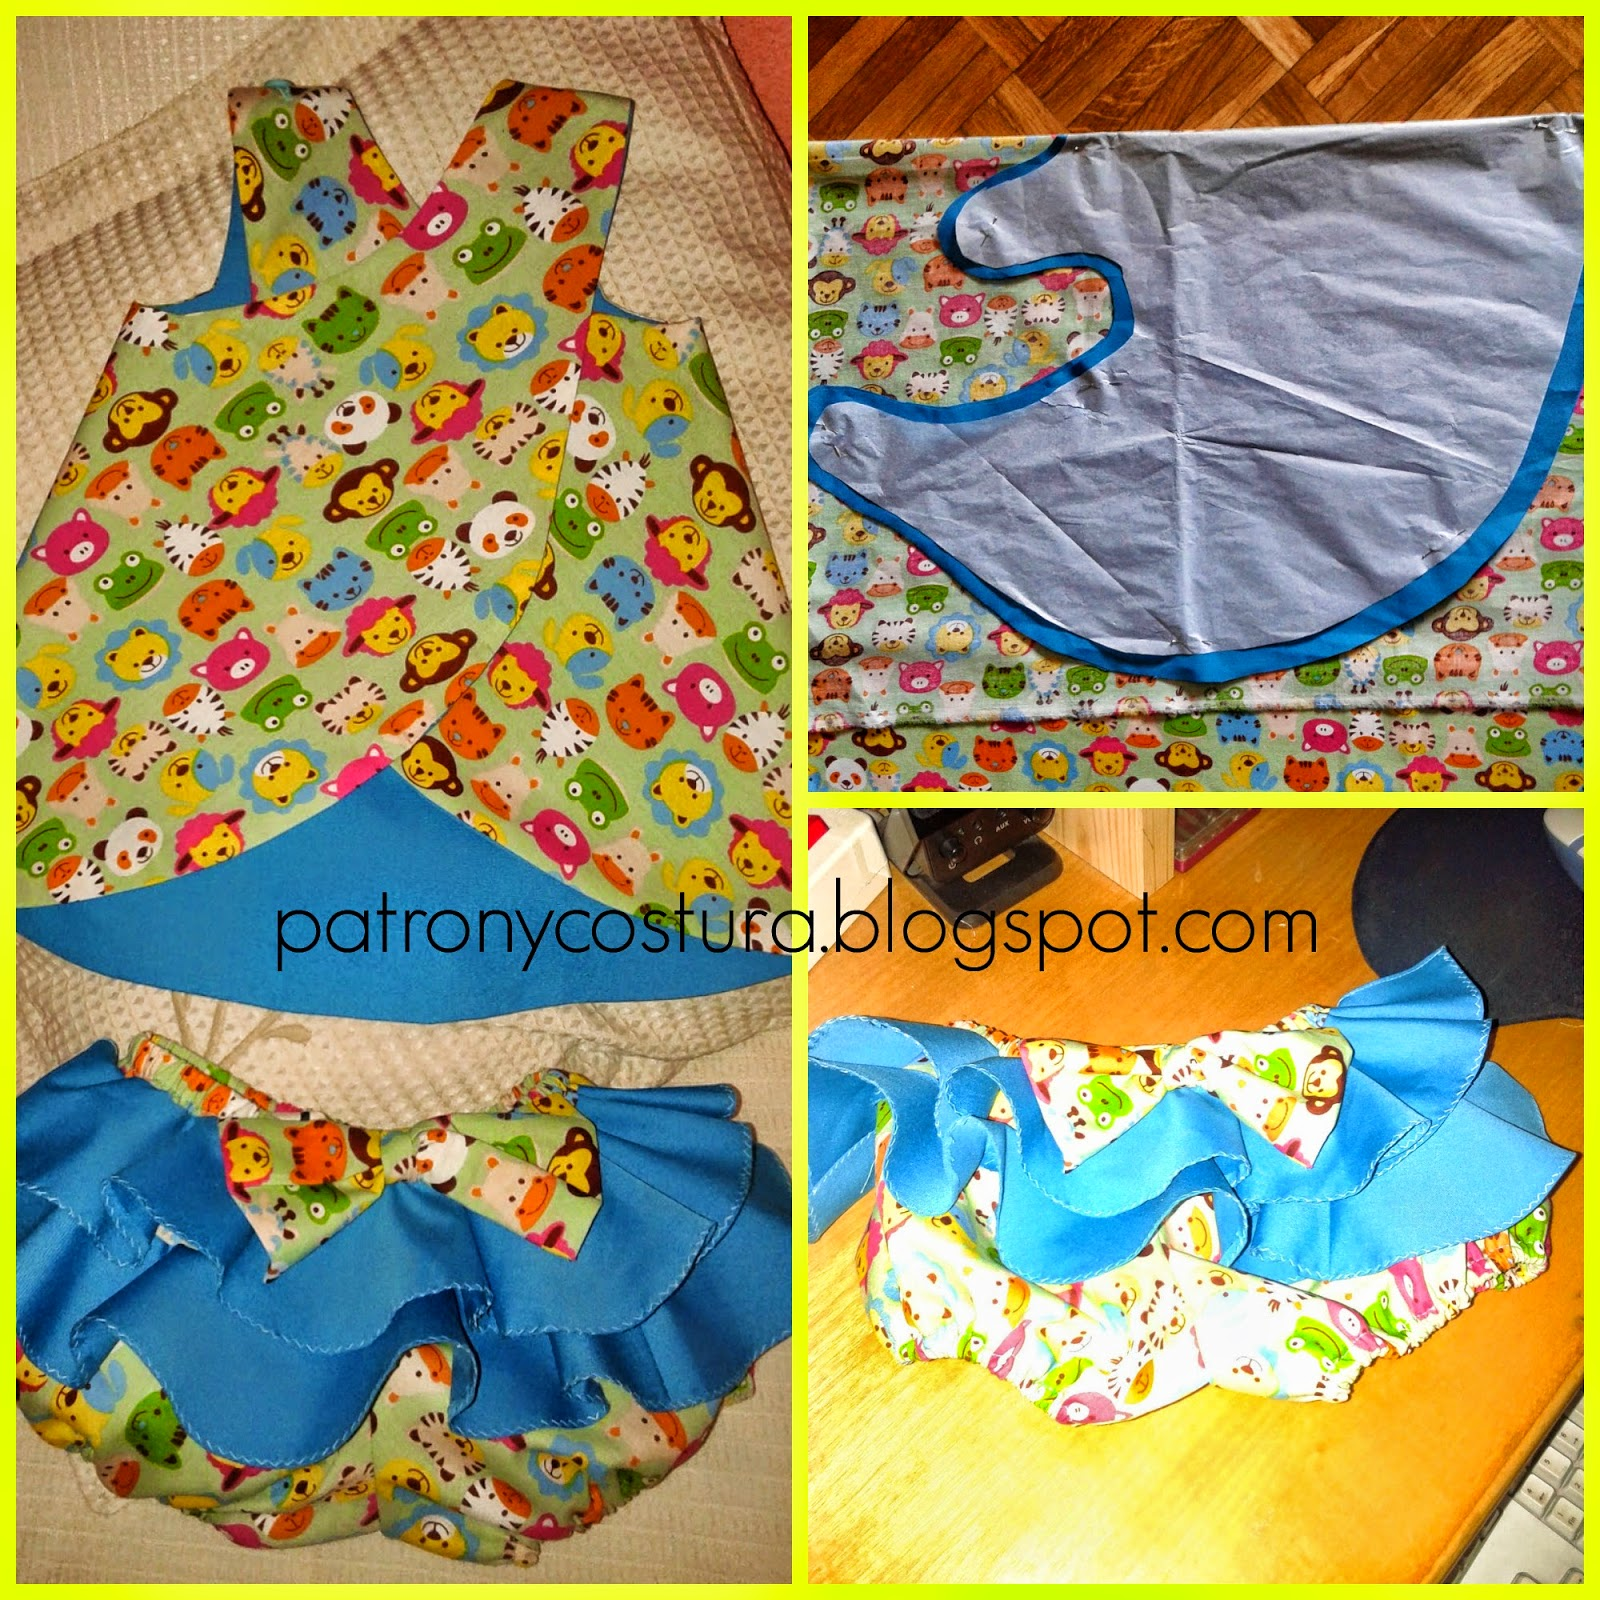 http://patronycostura.blogspot.com.es/2014/03/tema-37-vestido-pinafore-con-pantalon.html